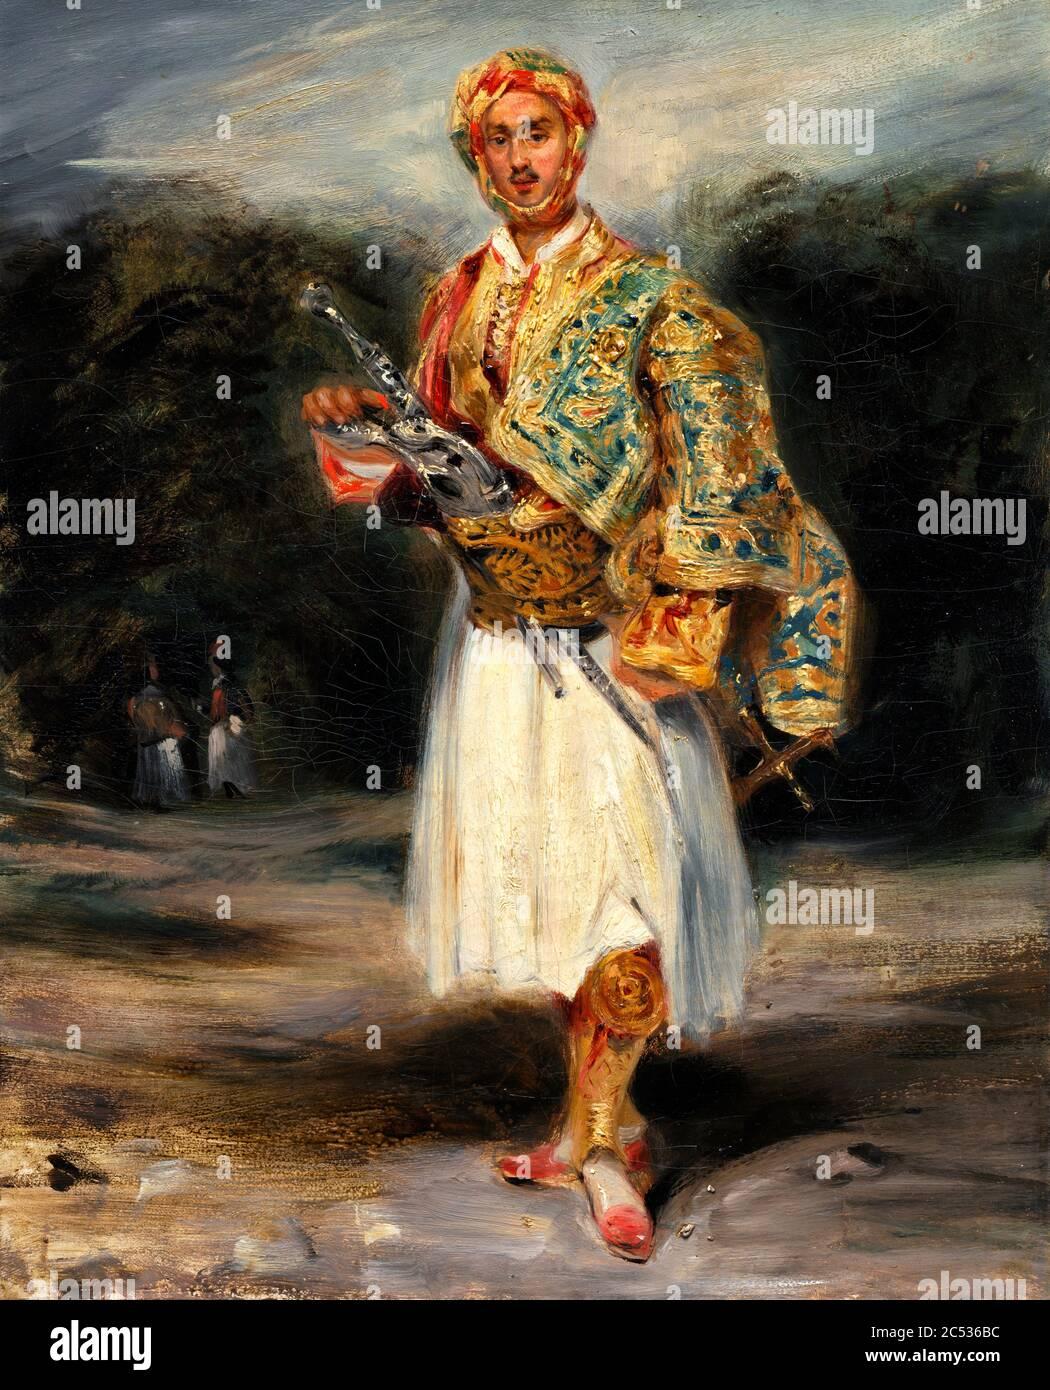 Count Demetrius de Palatiano in Suliot Costume by Eugene Delacroix Stock Photo